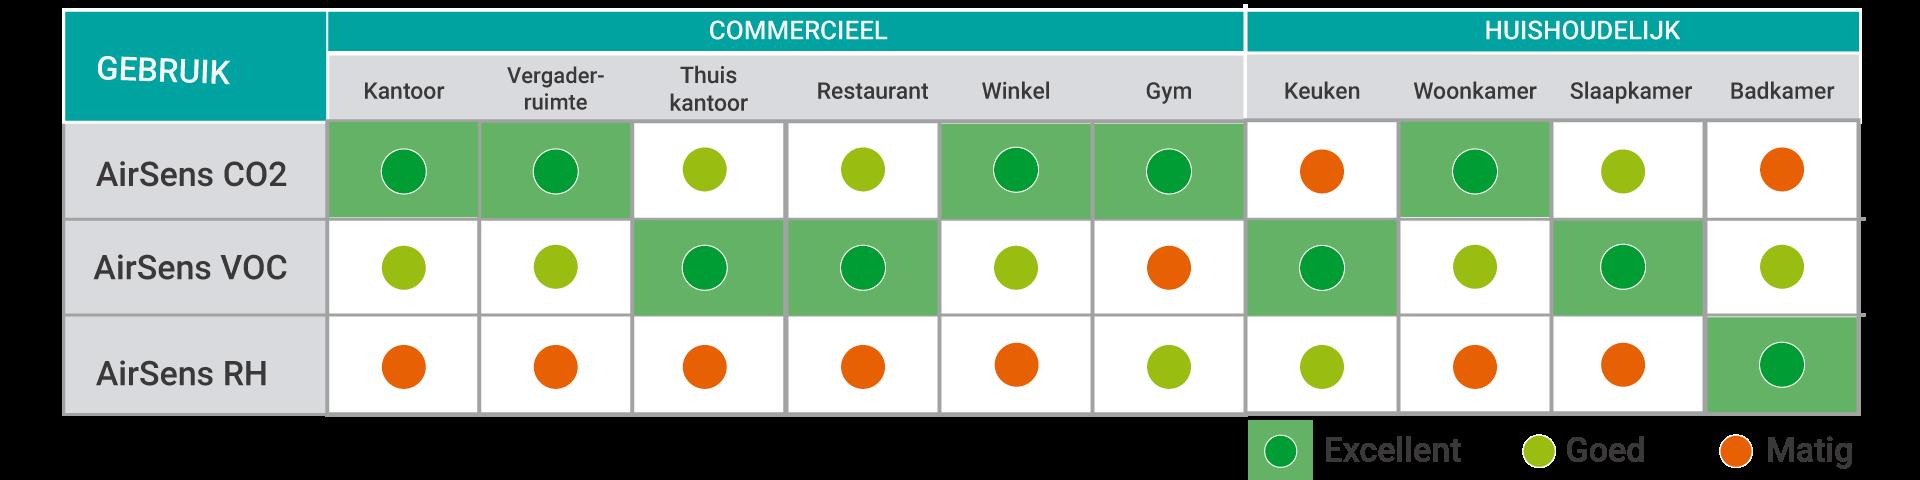 tabla-comparativa-nl.png